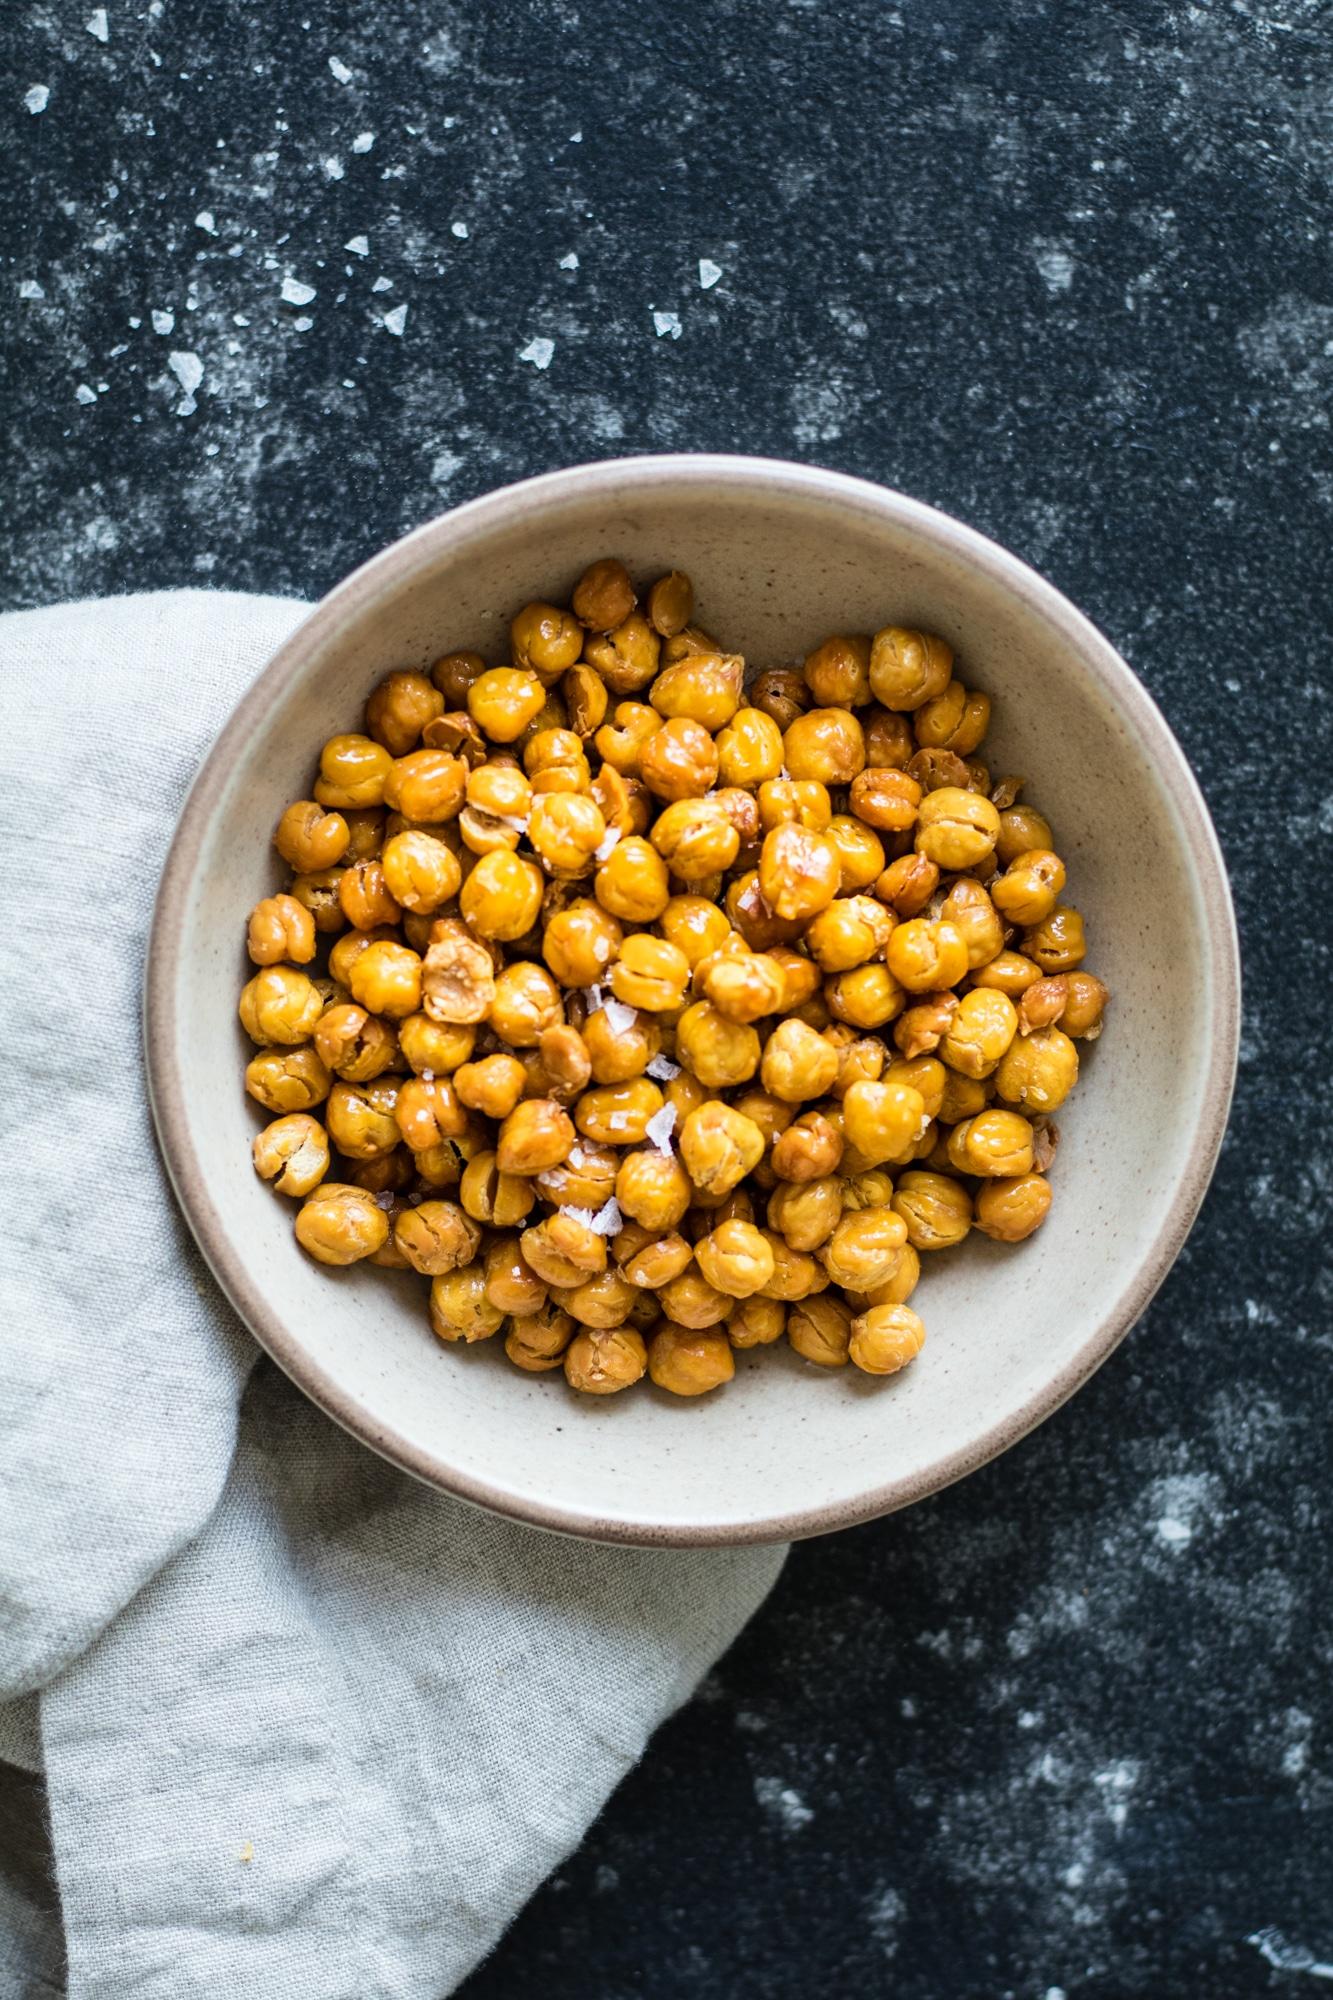 Roasted Chickpeas with Salt - perfect snack or top on salads! krollskorner.com